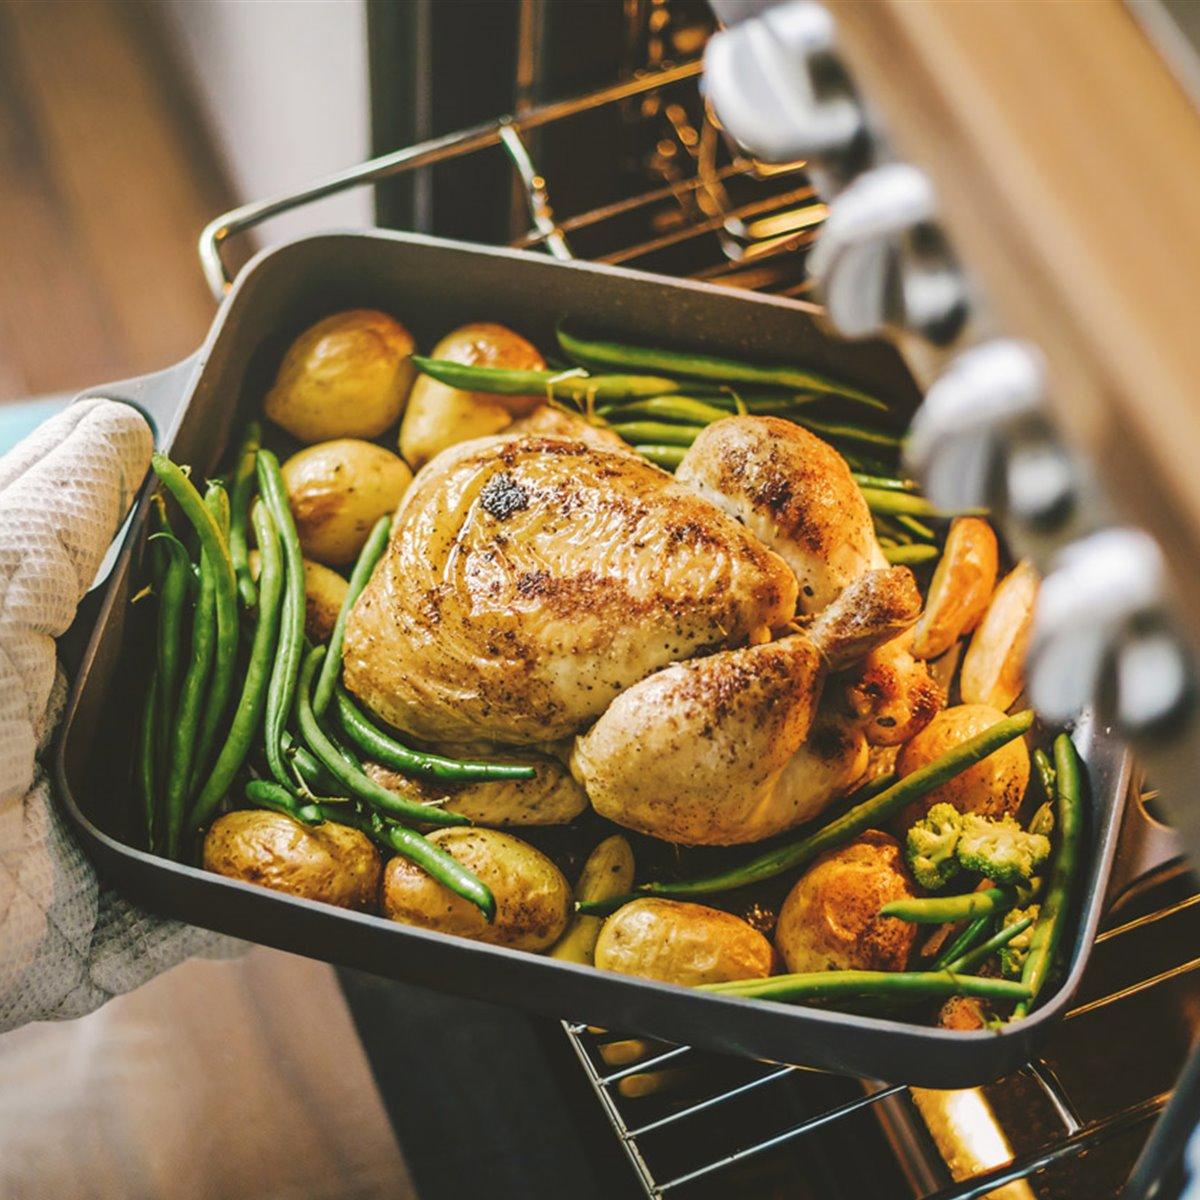 Pollo al horno nuevo